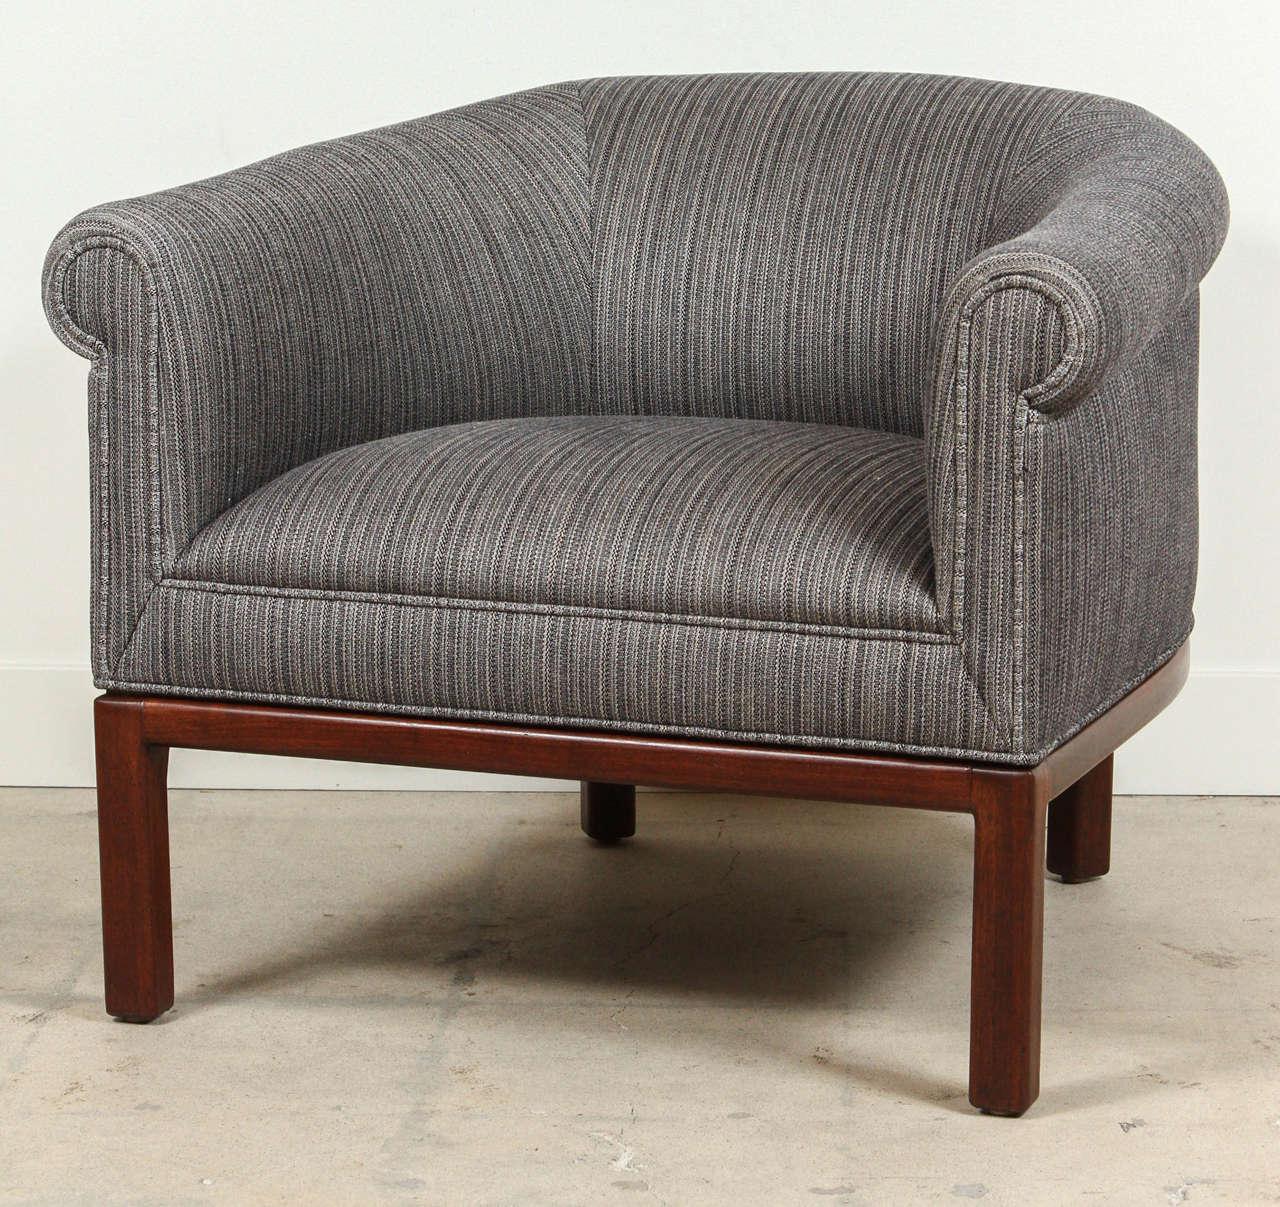 Pair Of Barrel Back Chairs By Jules Heumann For Metropolitan Furniture. New  Cotton/silk